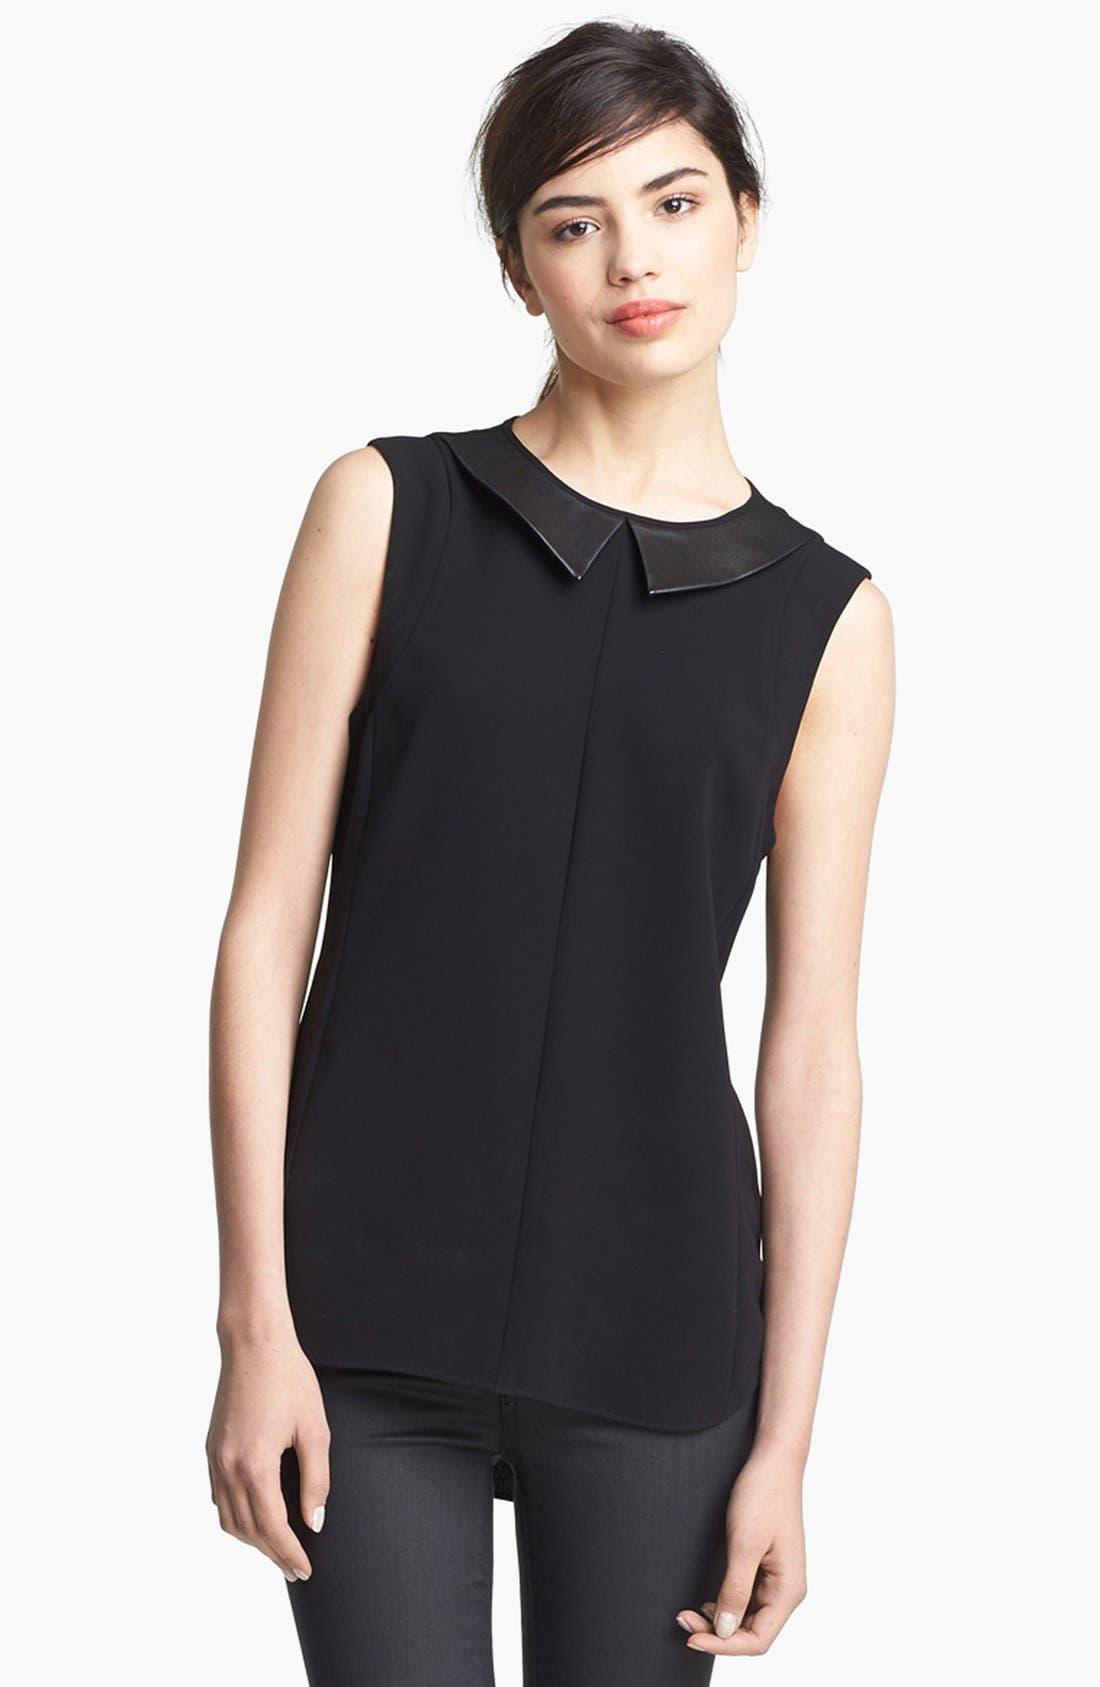 Main Image - rag & bone 'Astrid' Leather Collar Top